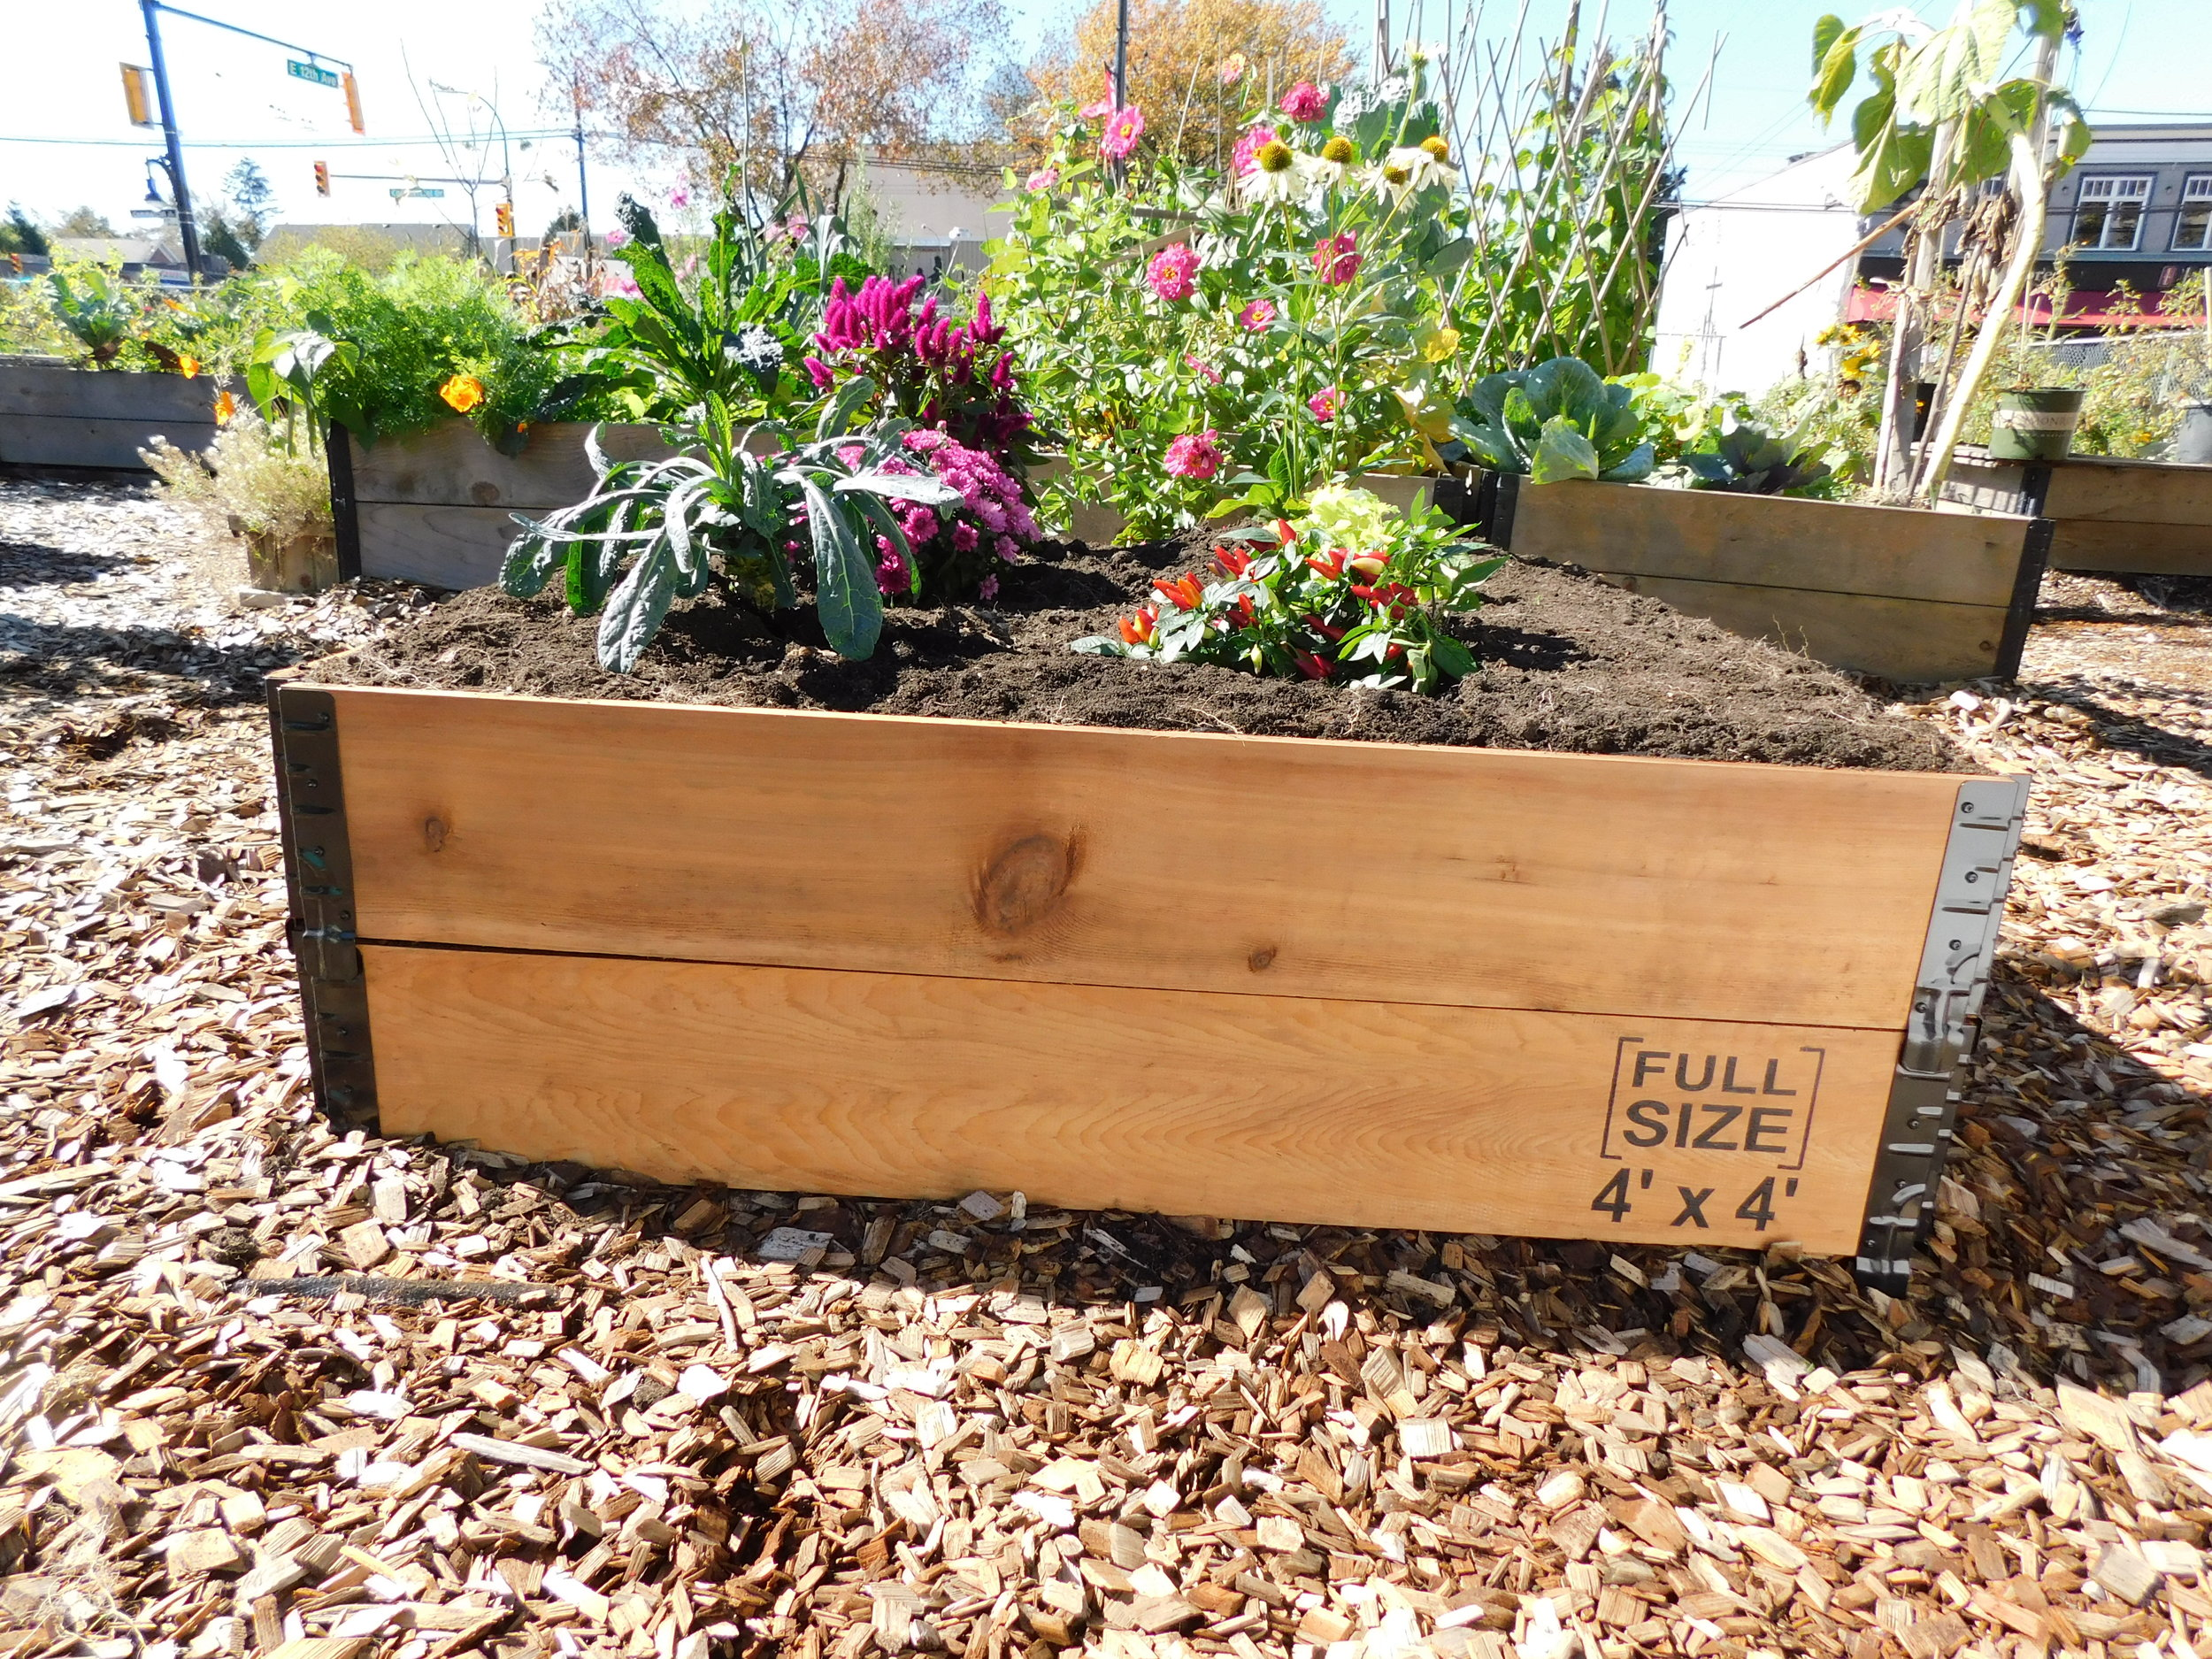 Shifting Growth 39 S Raised Gardens